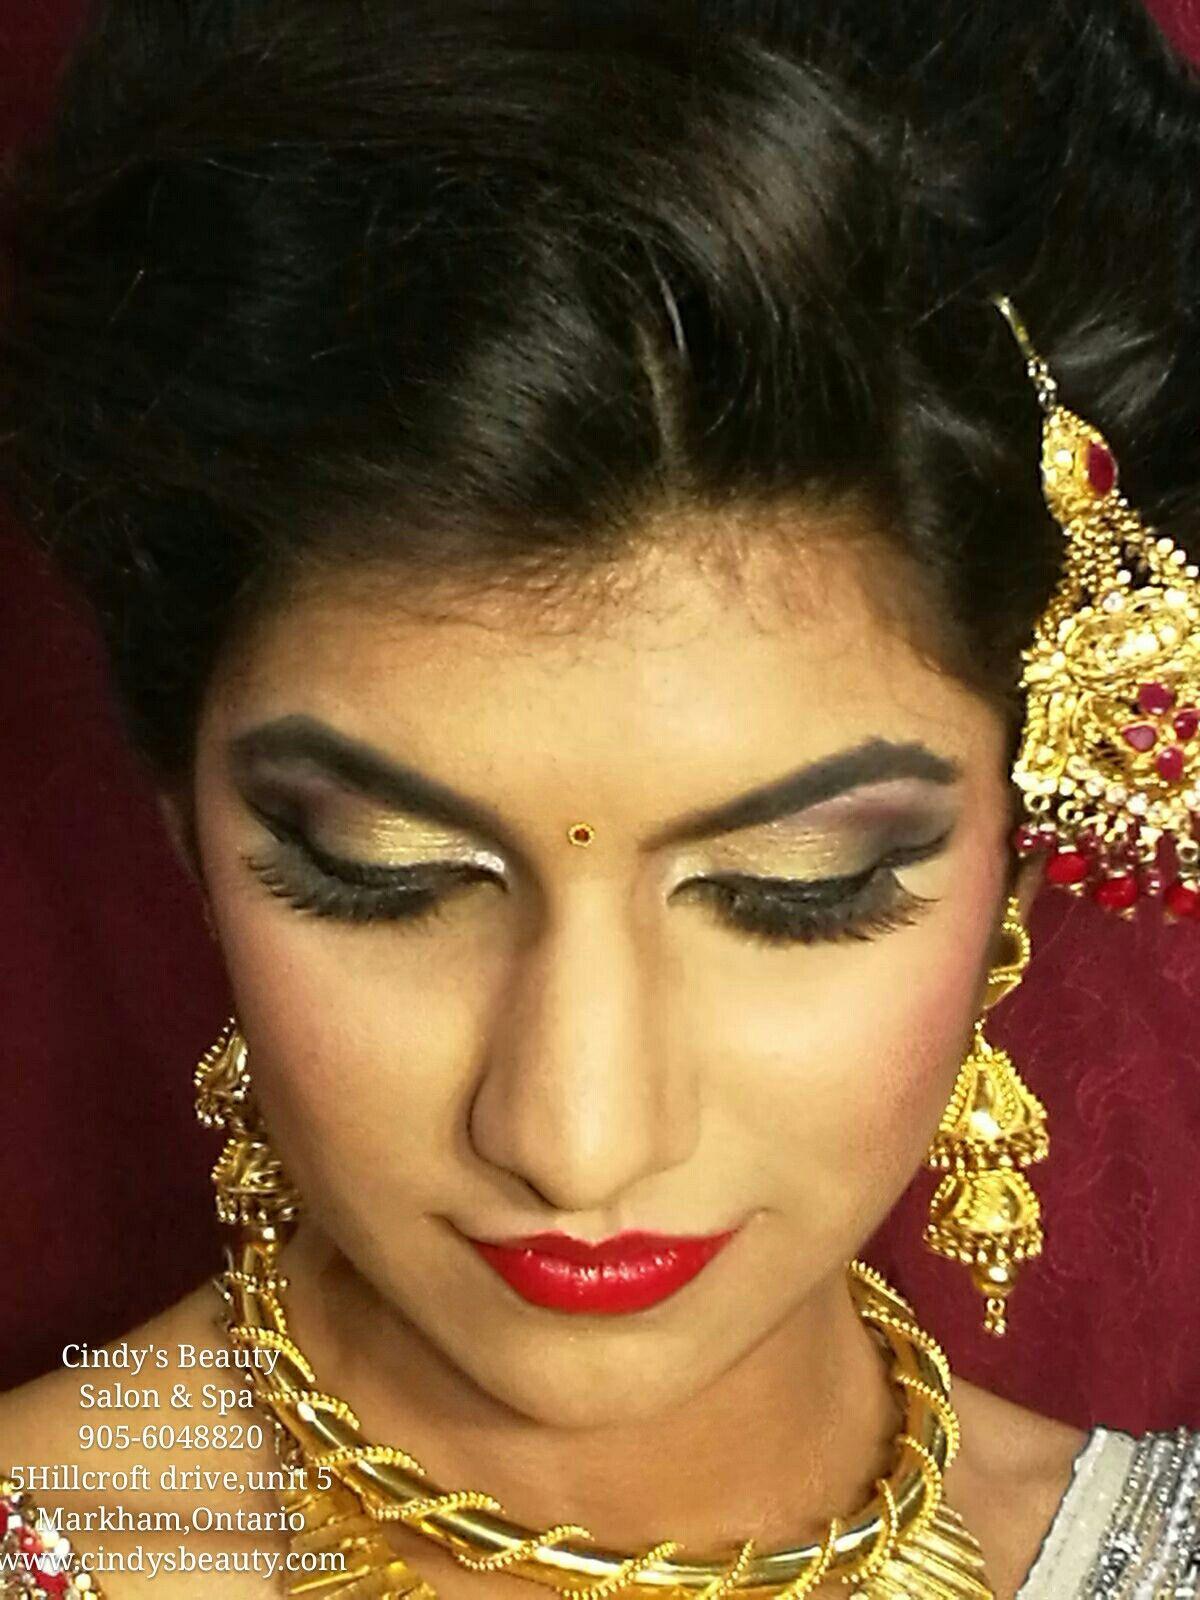 #cindysbeauty #salon #spa #party #hair #makeup #south #Indian #Tamil #Pakistani #bridalmakeup #lengha #model #fashion #trendy #beauty #Markham # Toronto # ...